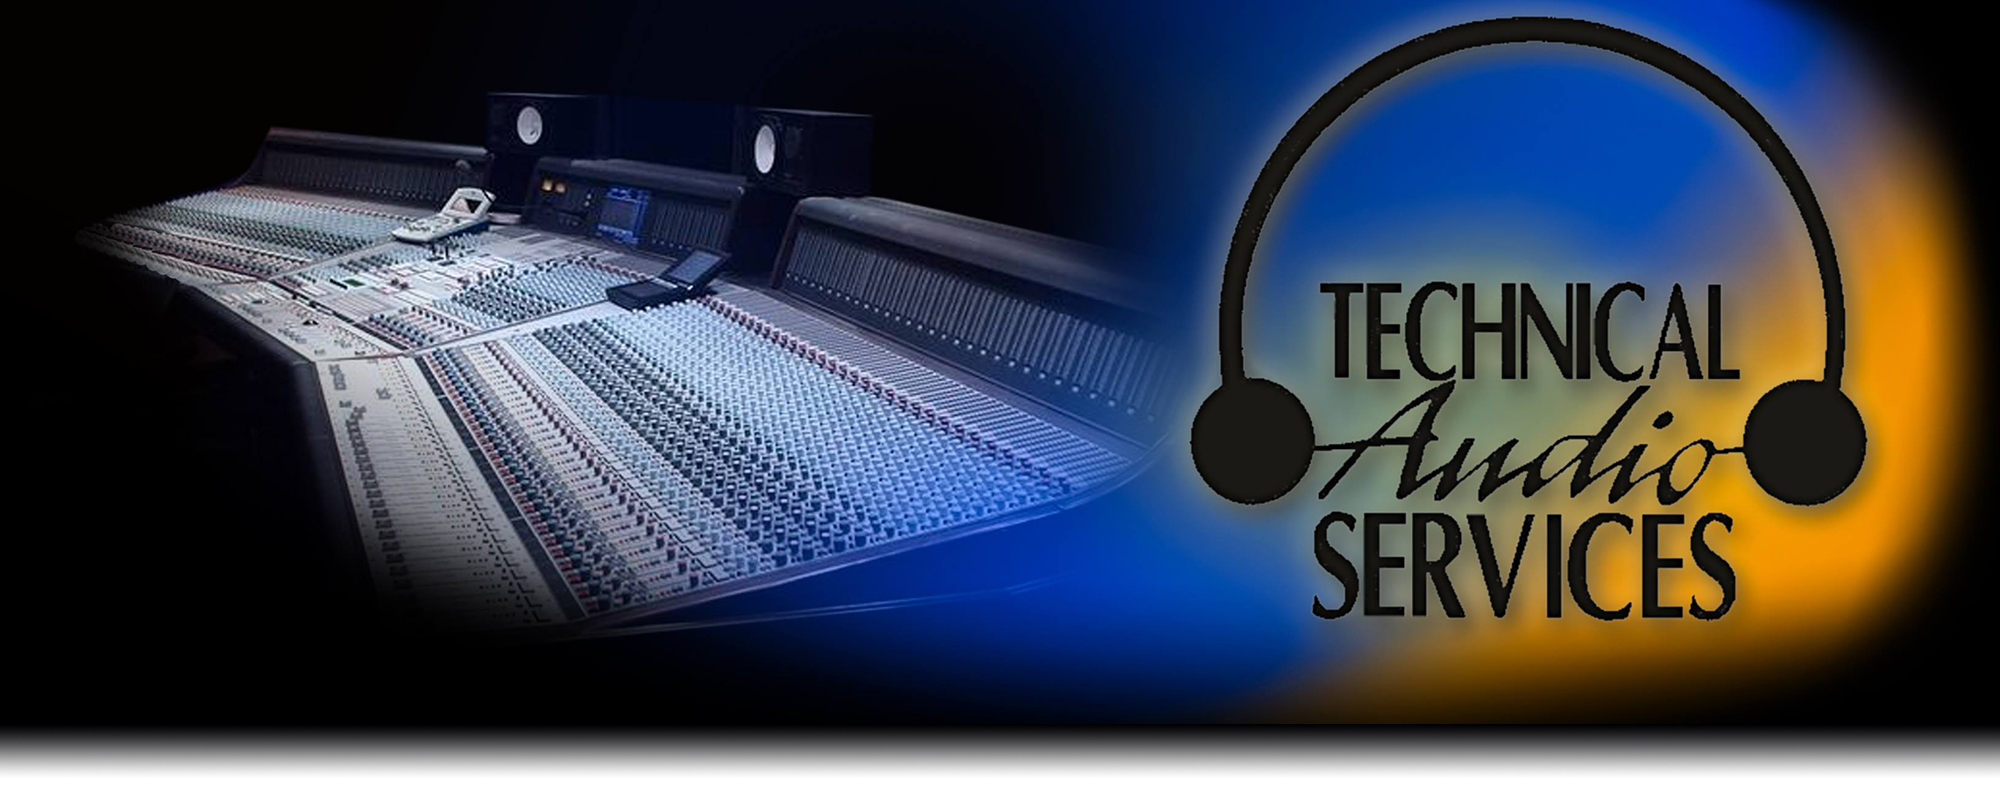 Technical Audio Services